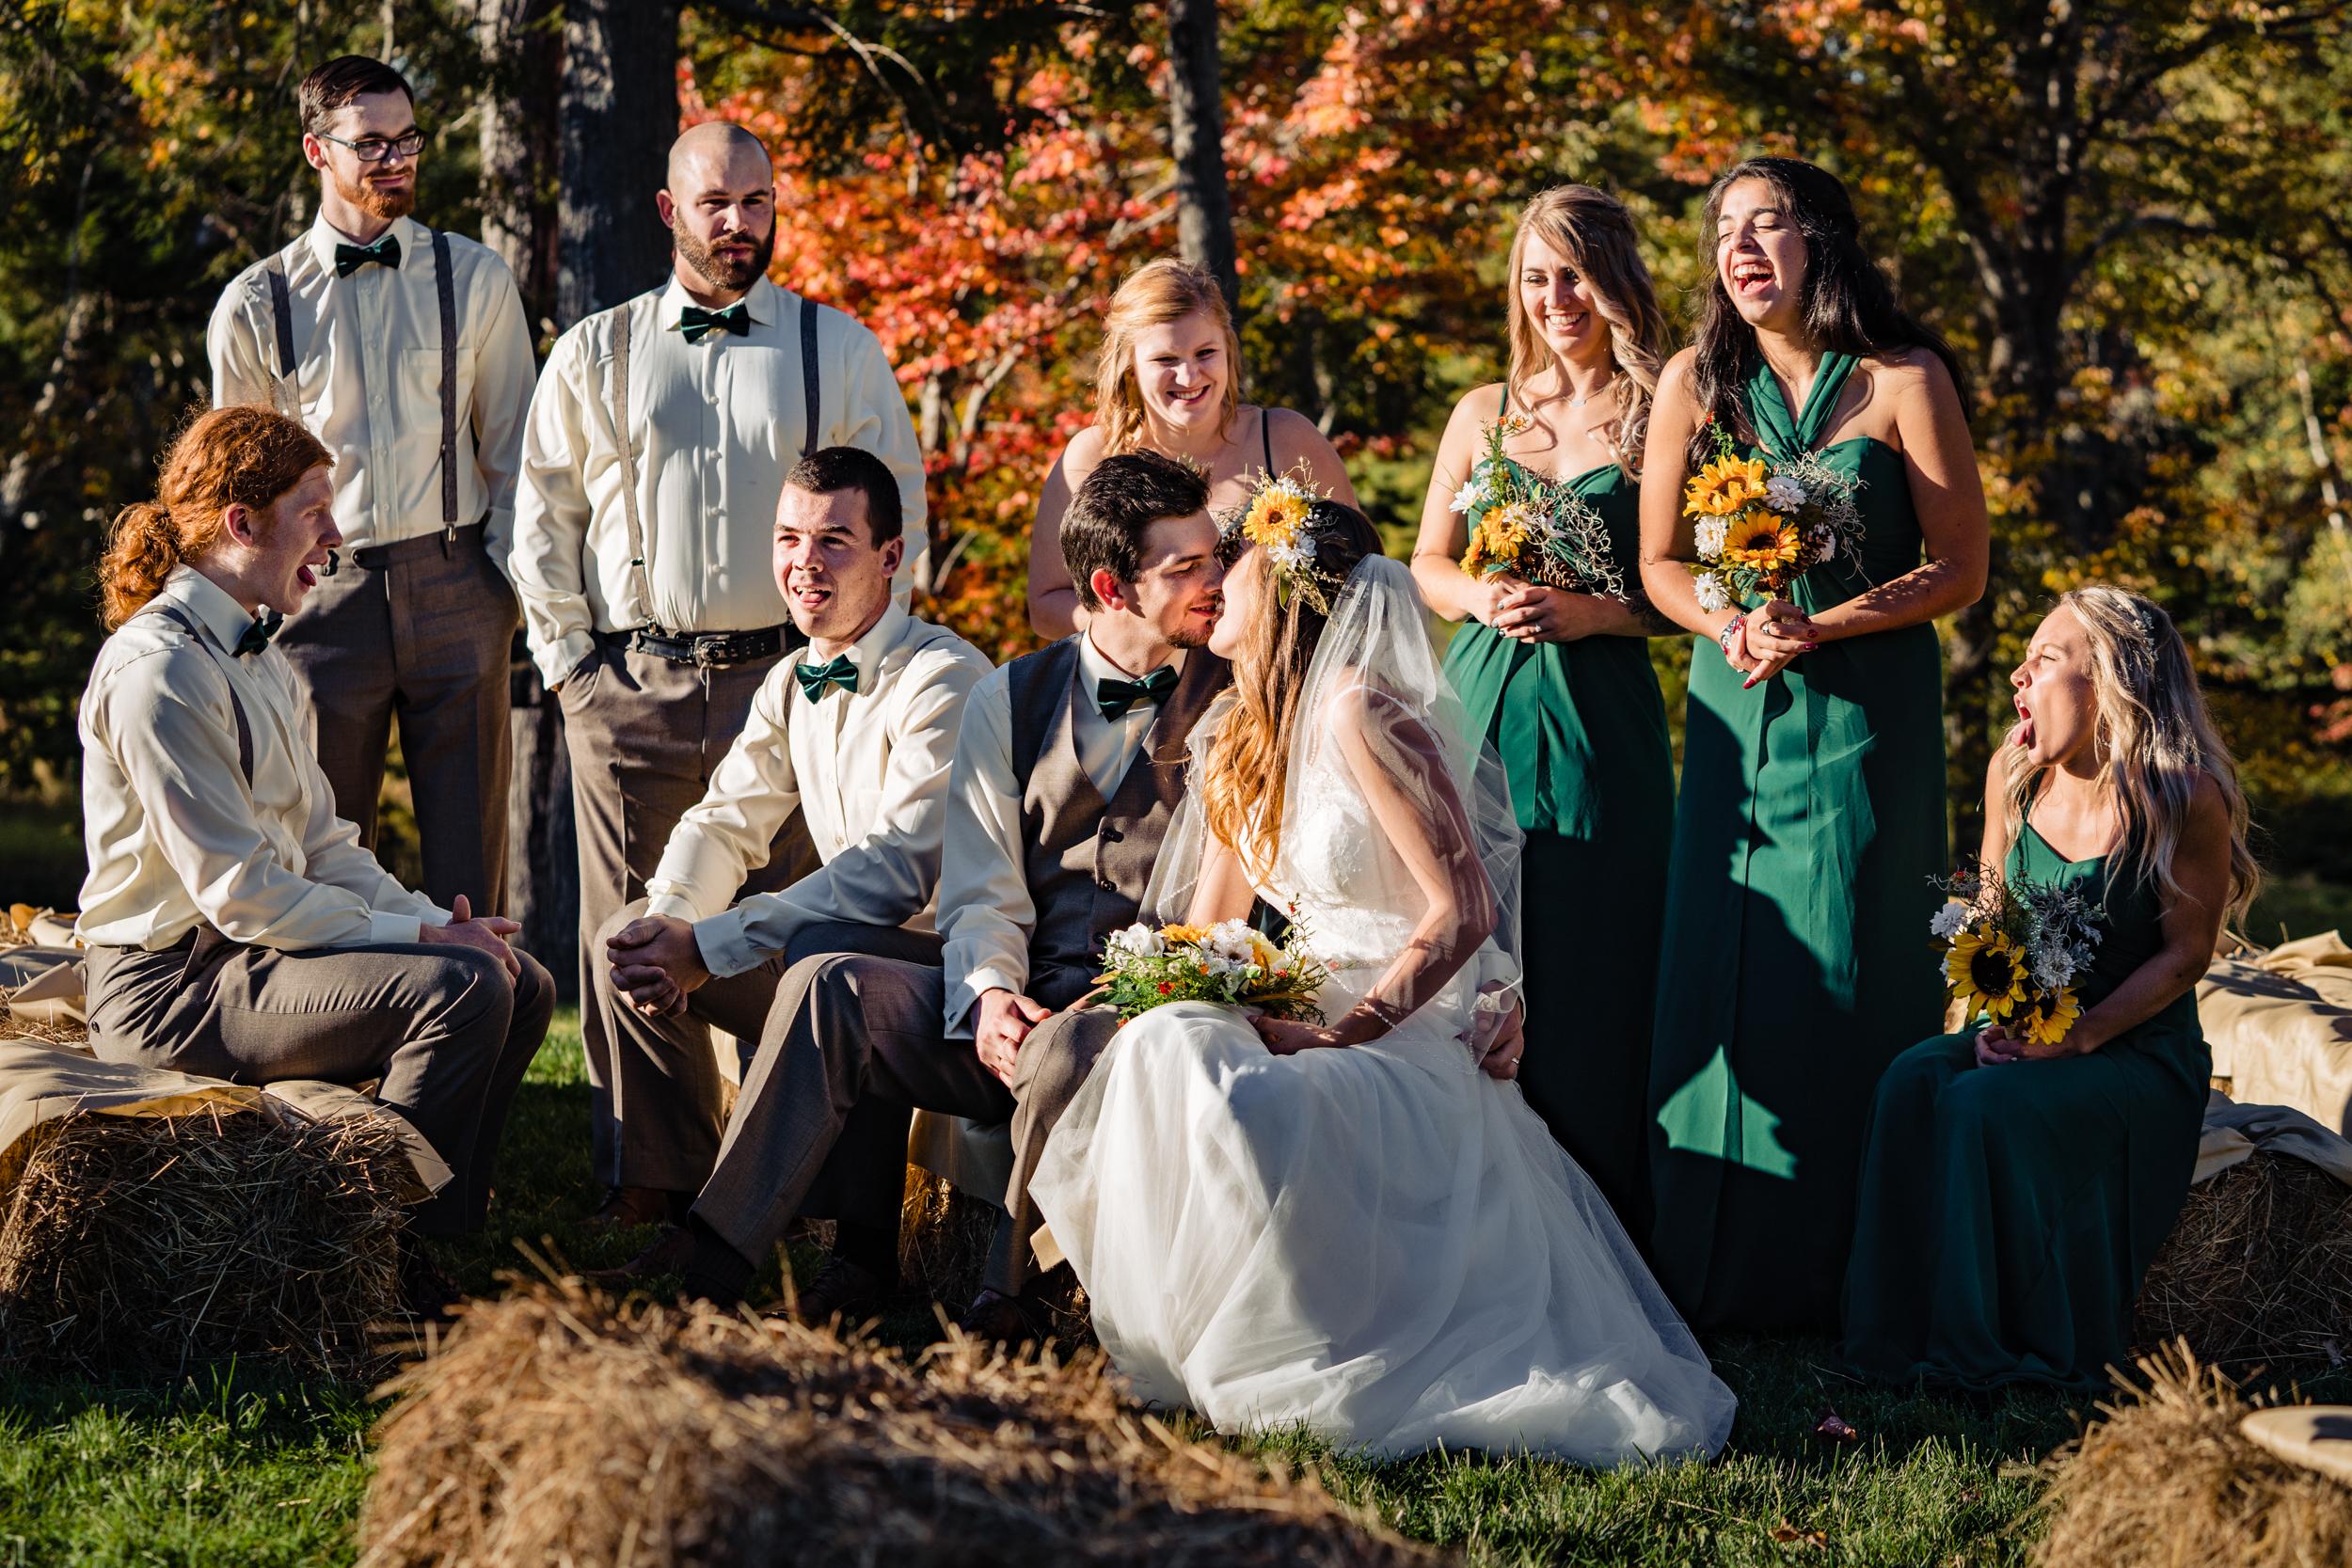 Halifax-wedding-photography-fall-photographers-novascotia-canada-ottawa (51 of 97).jpg